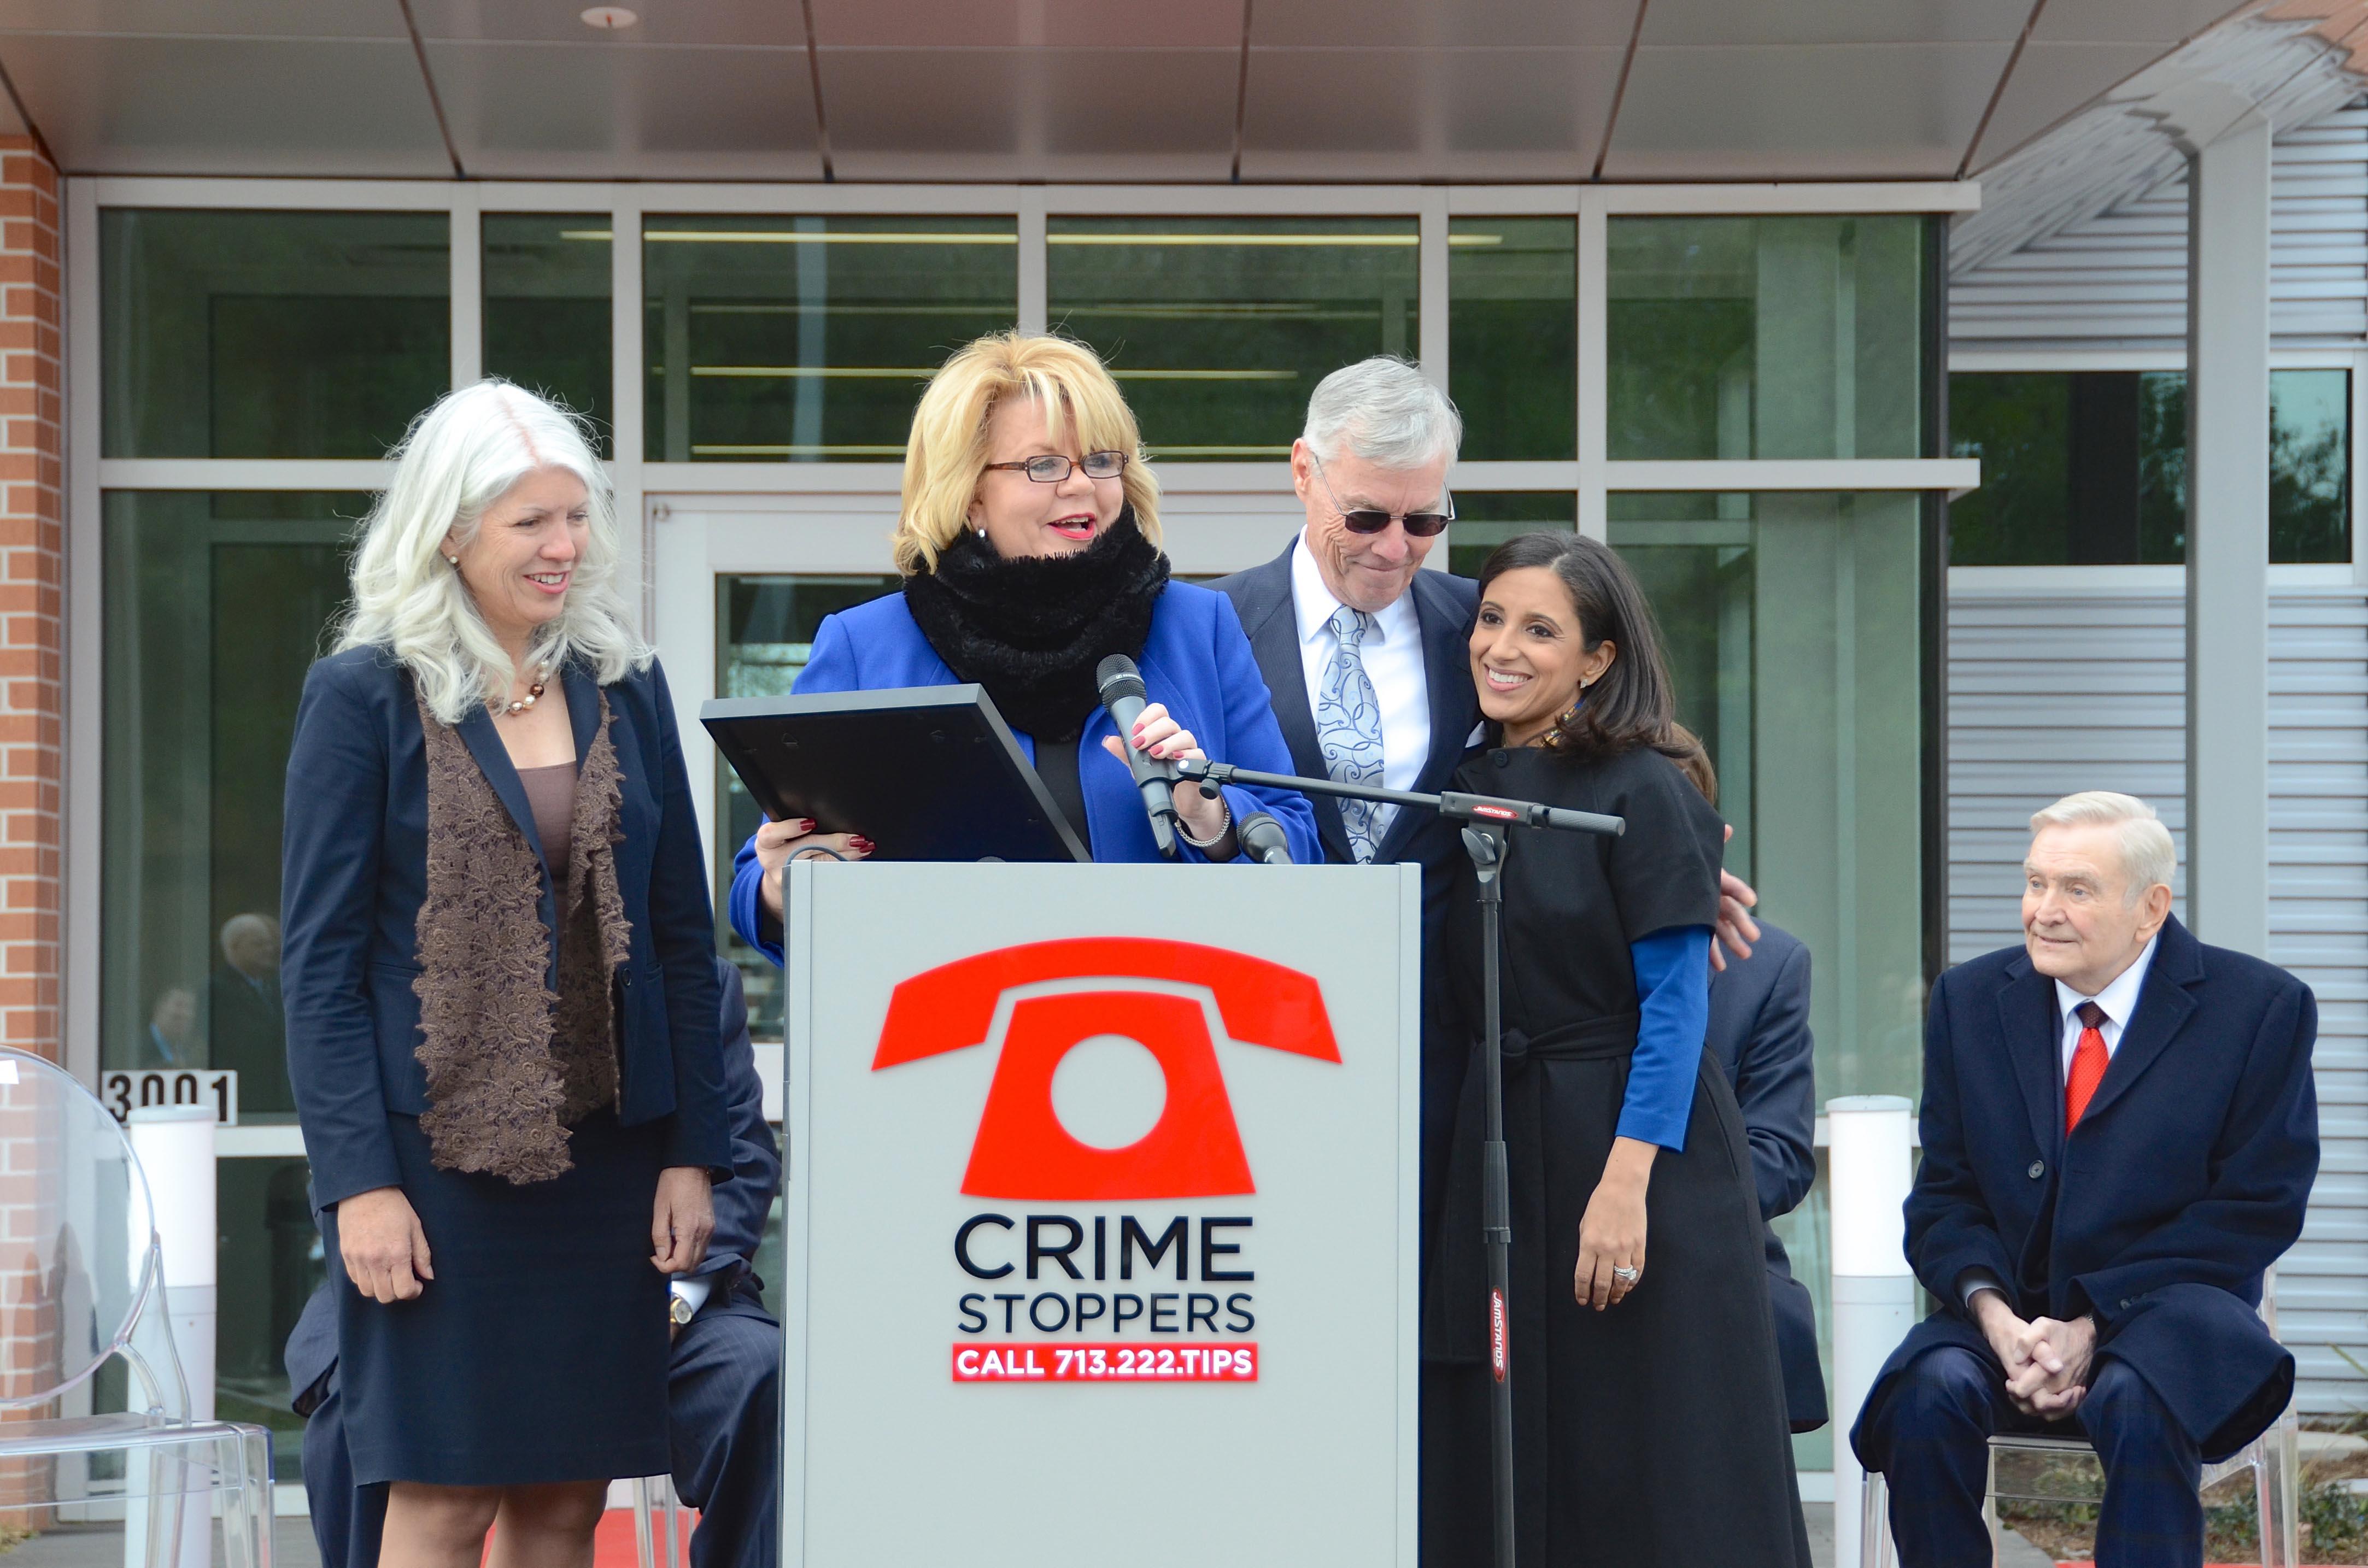 Presentation of City Proclamation, Council Members Karla Cisneros, Brenda Stardig and Jack Christie